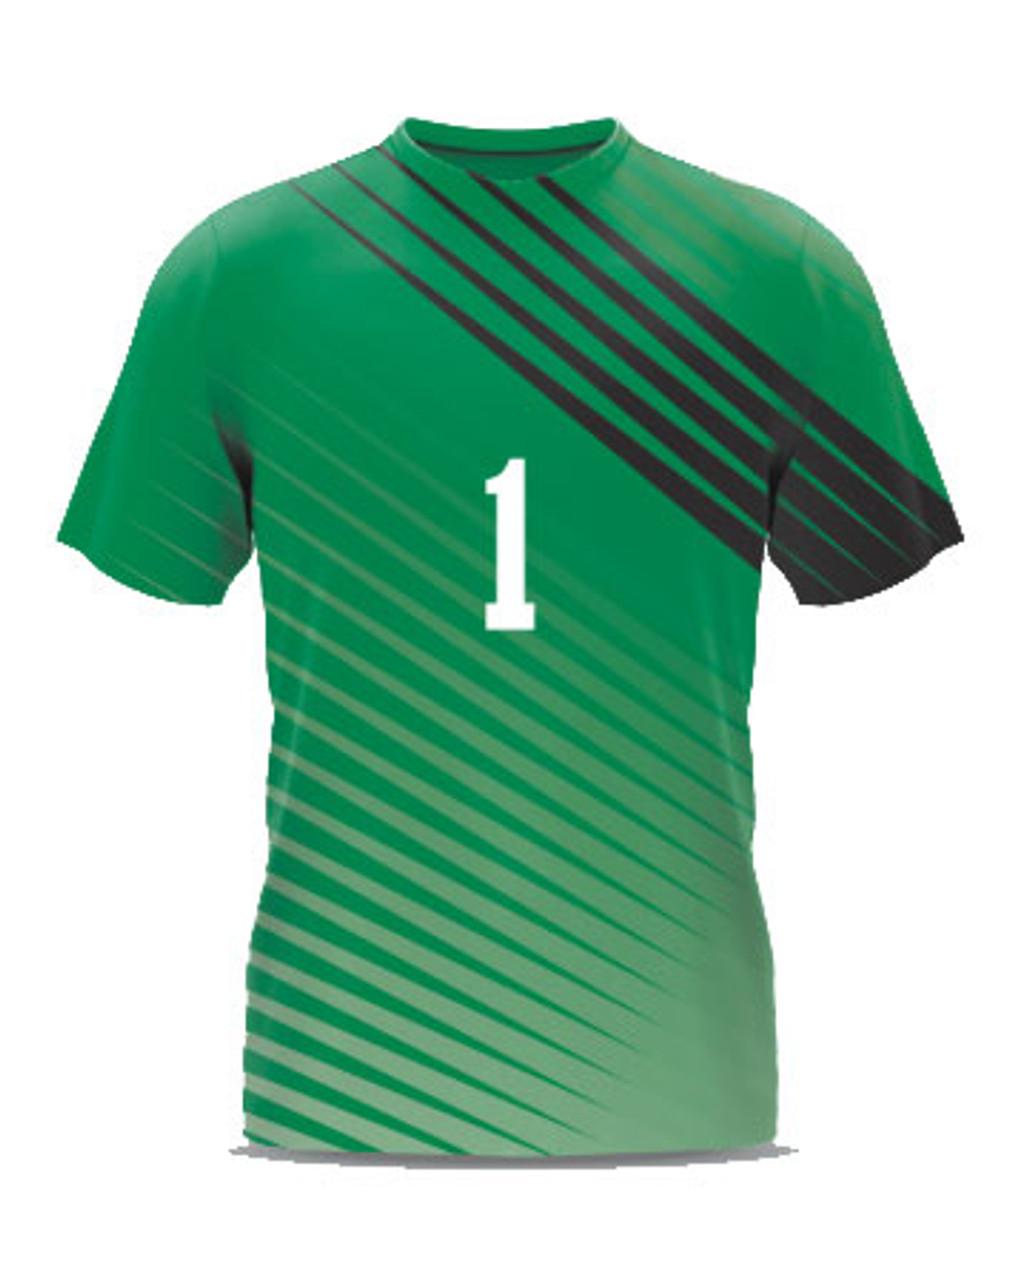 new styles 878a1 c1d89 Custom Sublimated Soccer Goalie Jersey